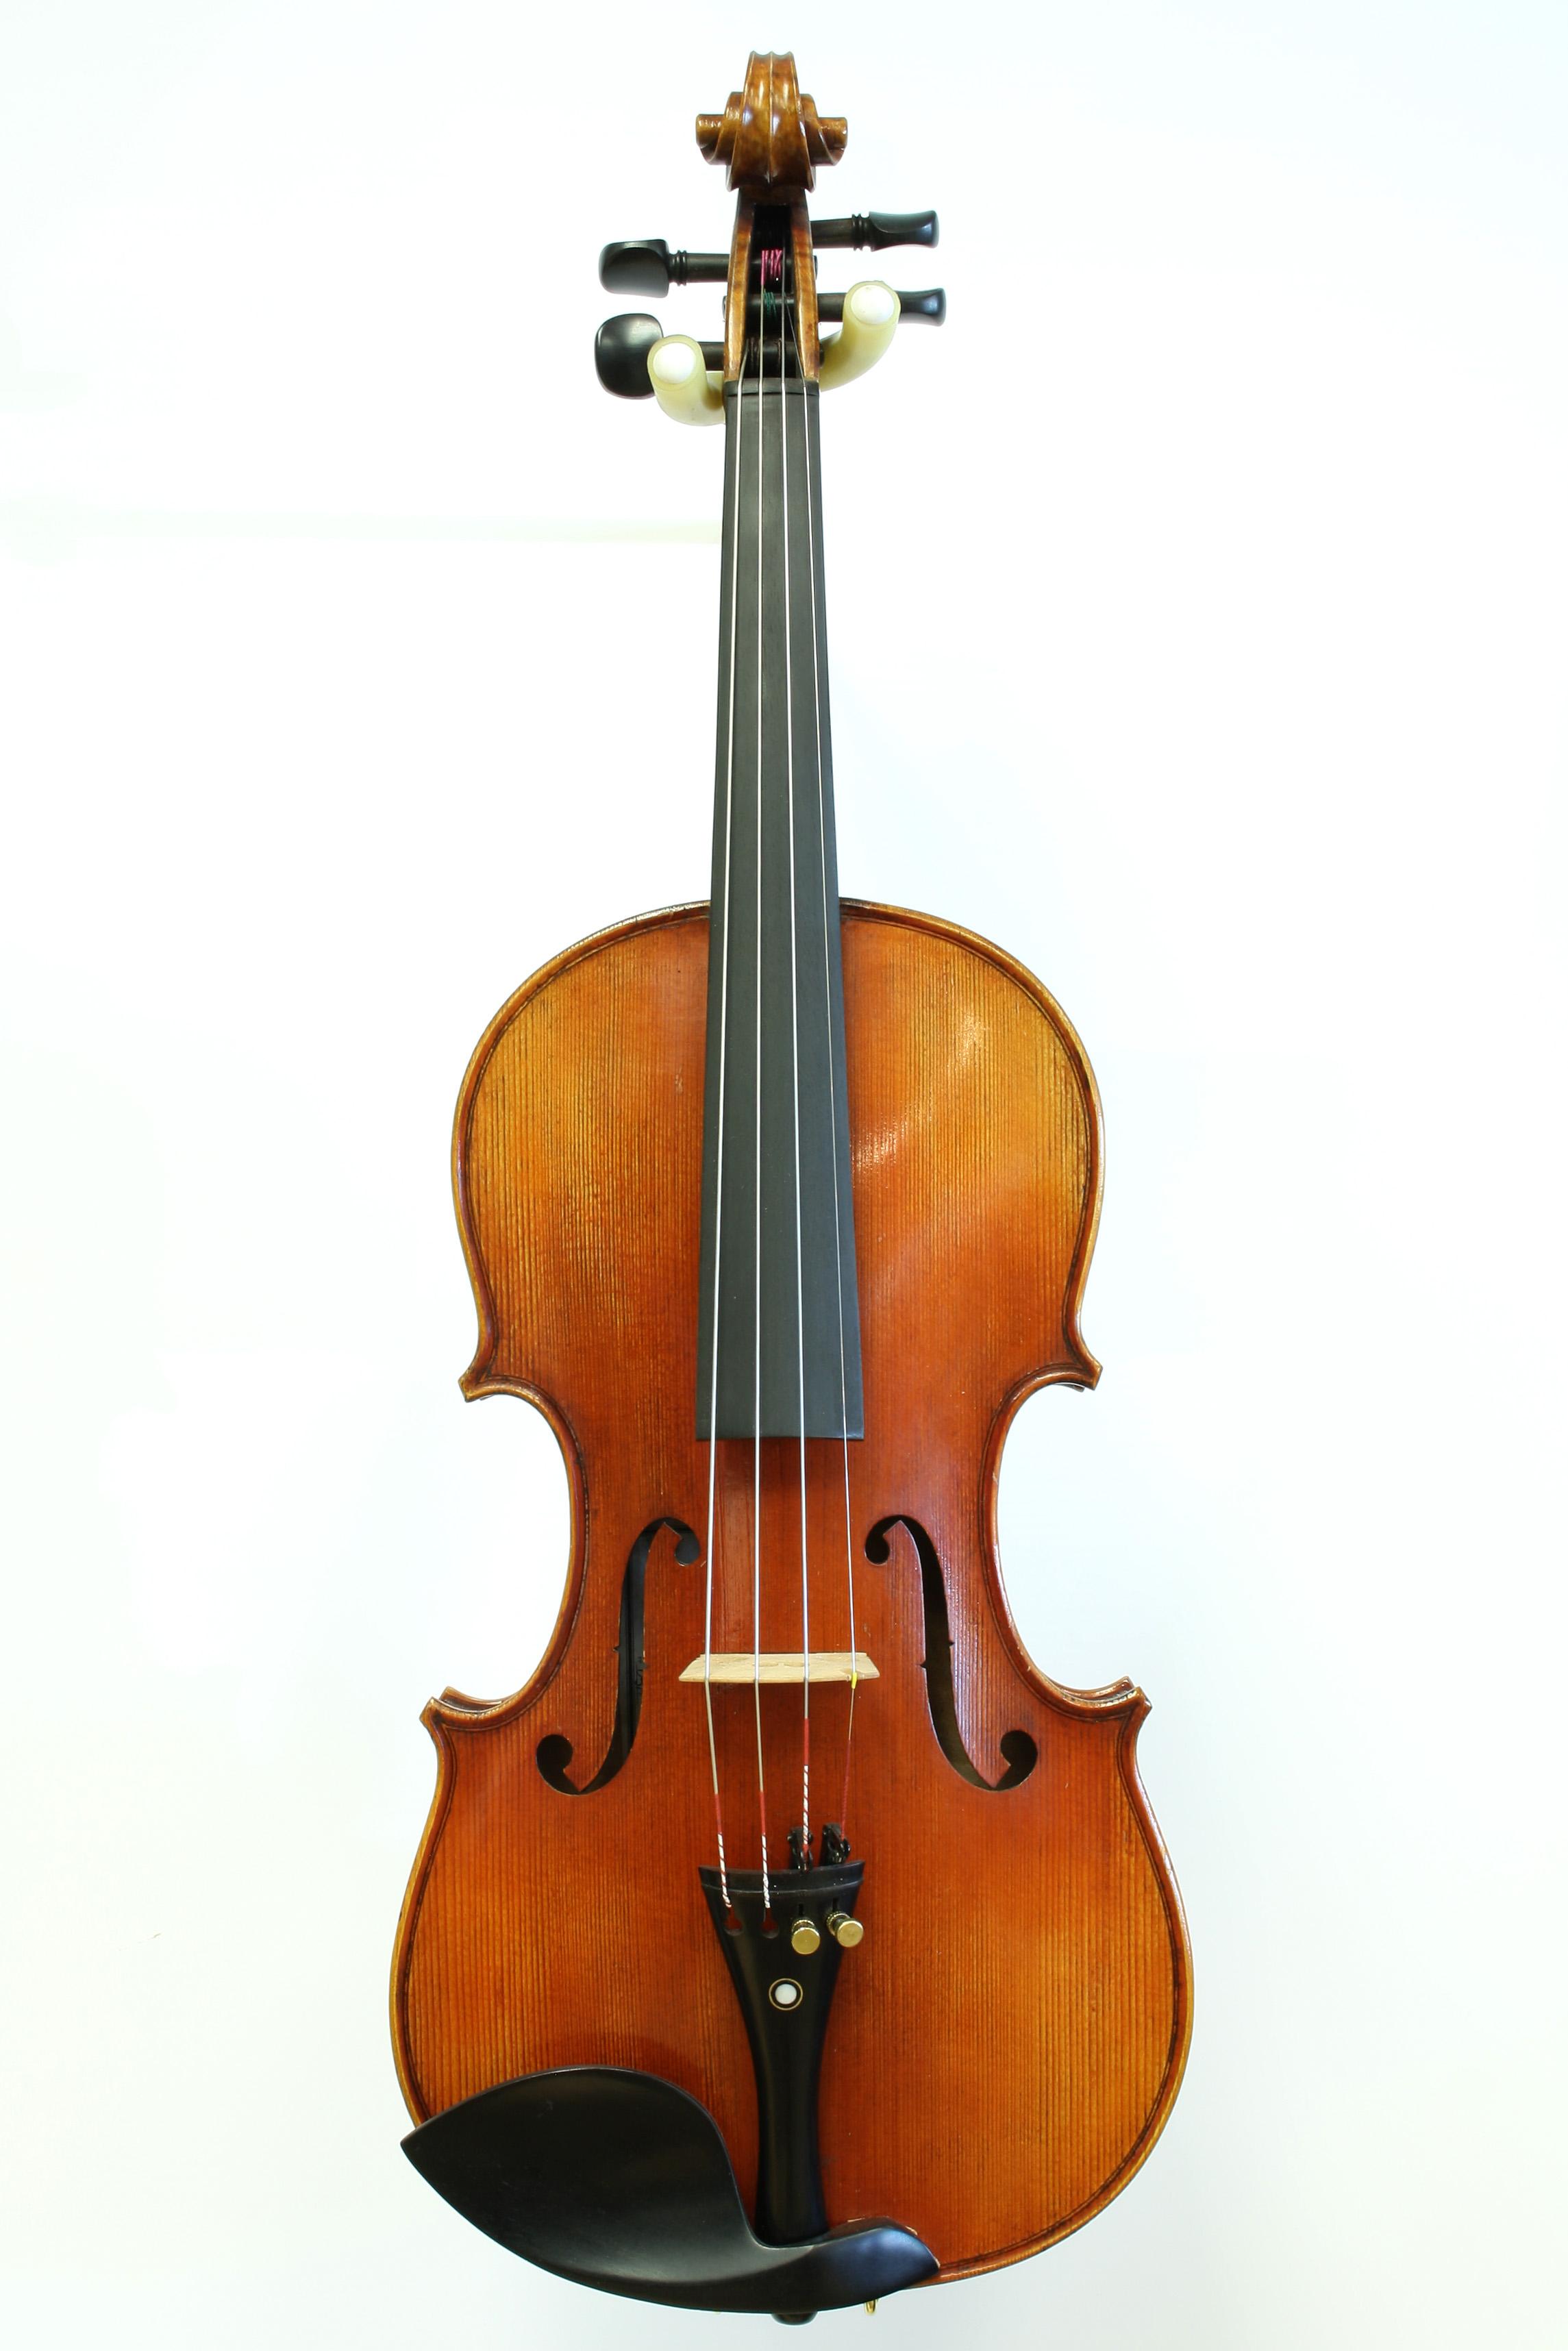 Carlita Violin - $699